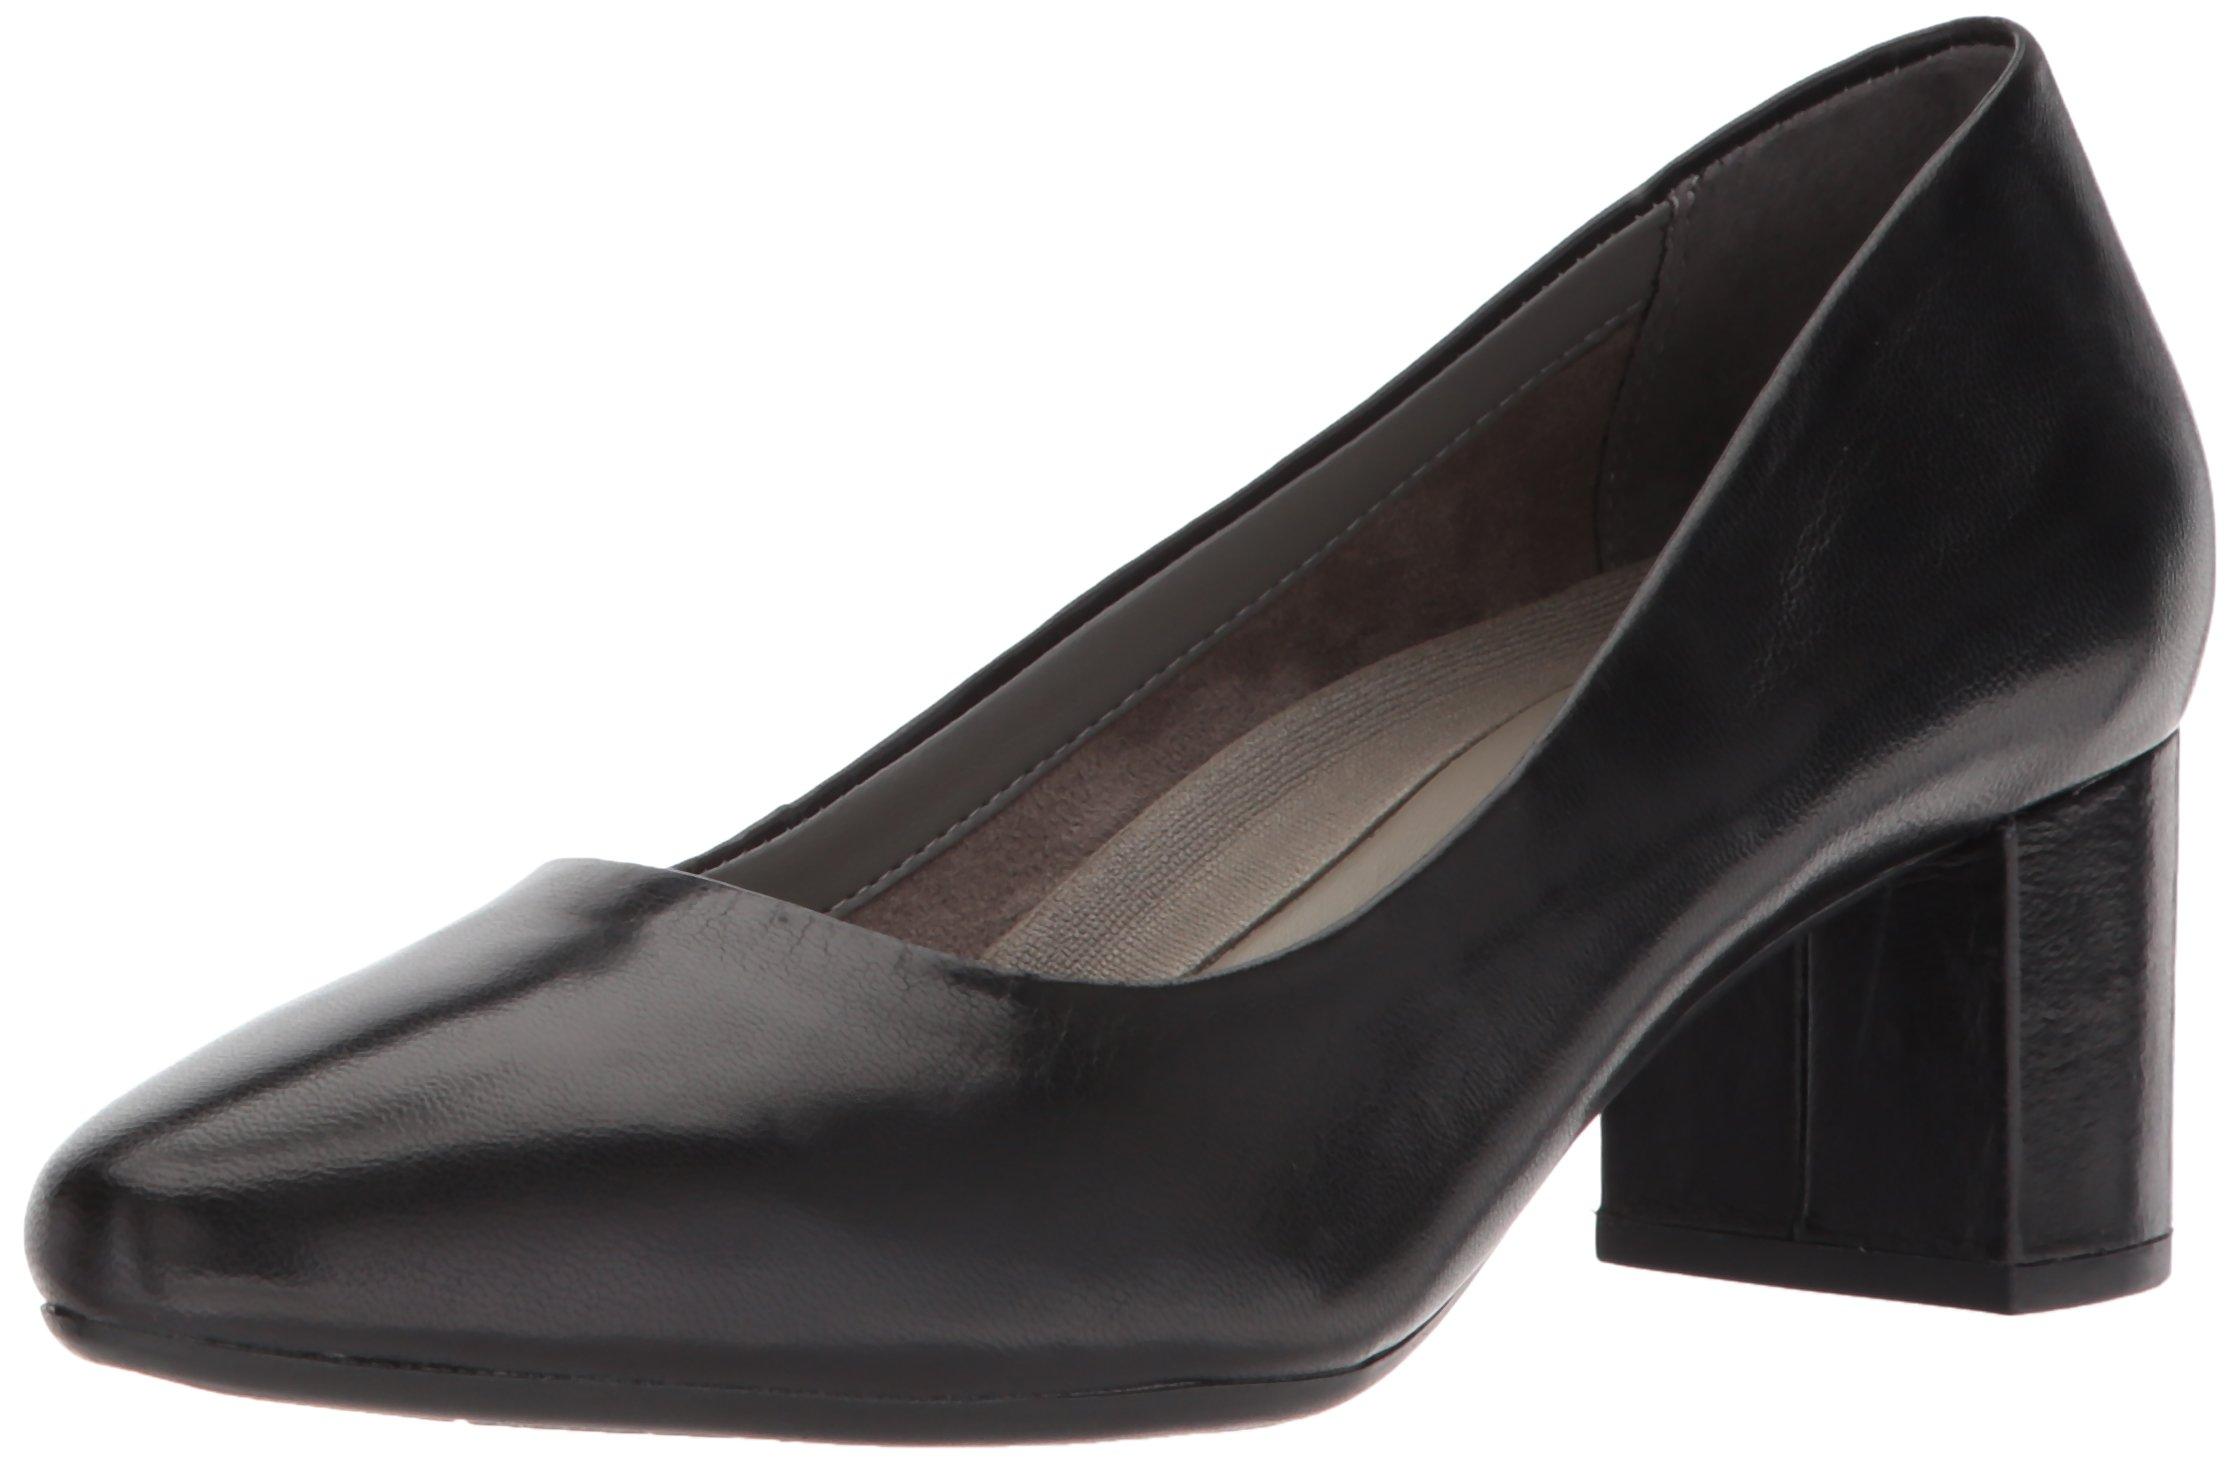 Aerosoles Women's Silver Star Pump, Black Leather, 7.5 W US